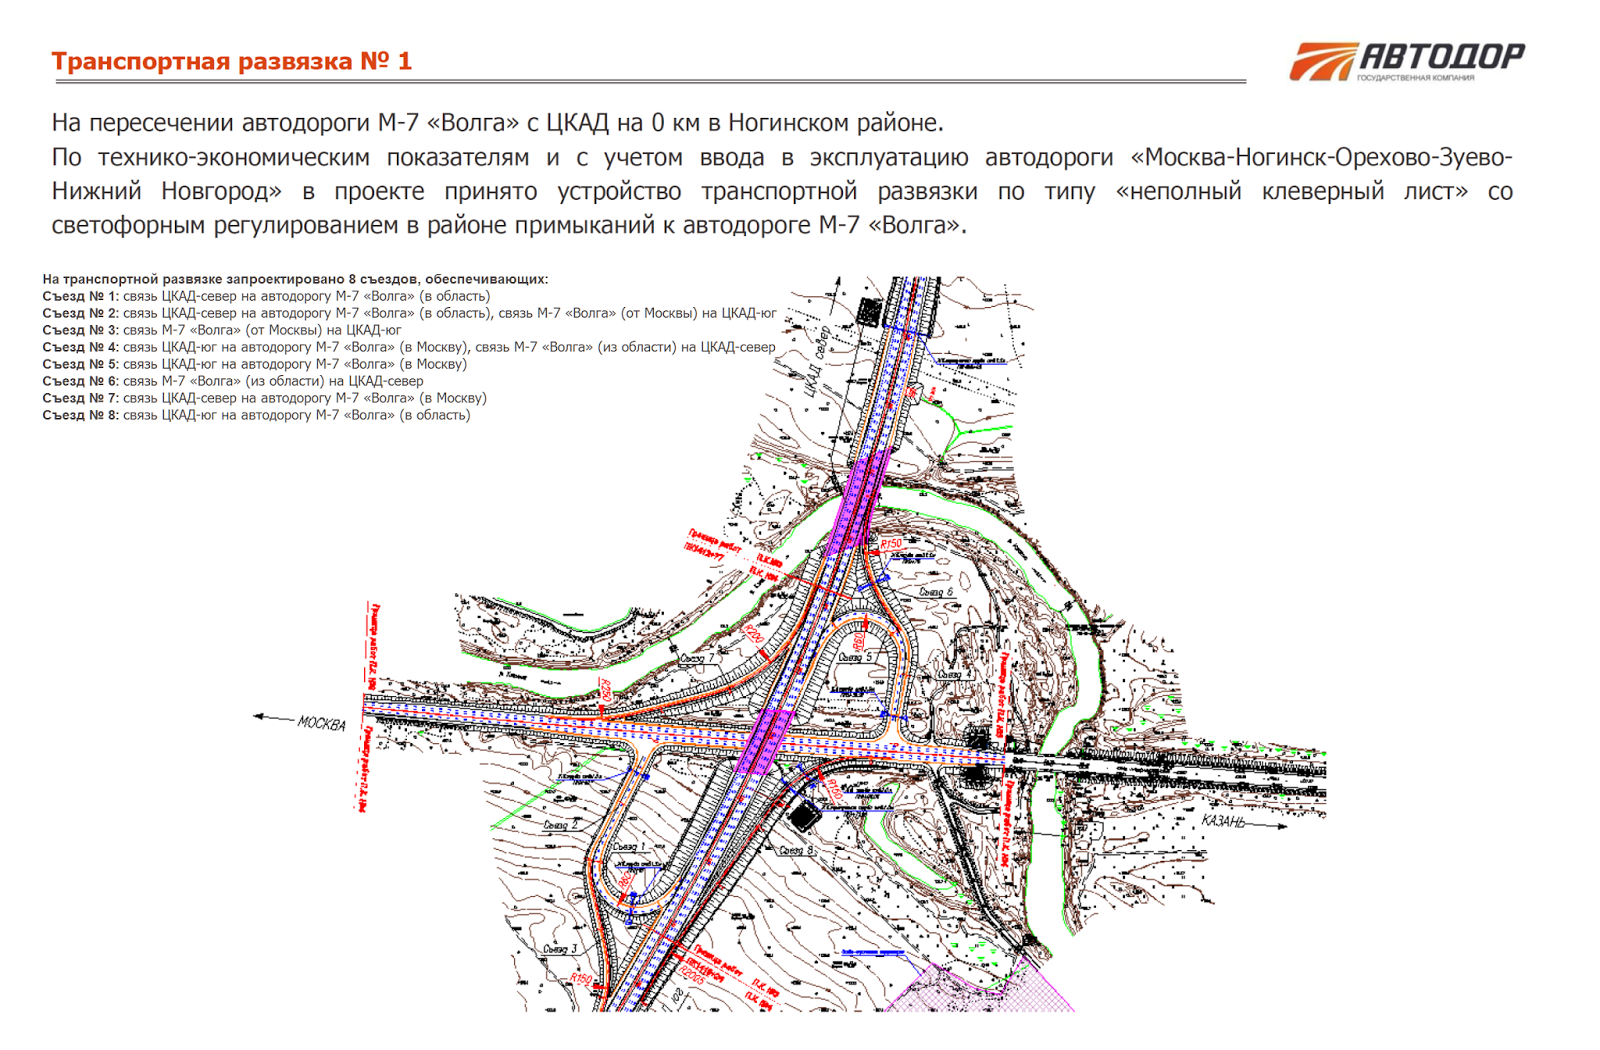 Схема цкад 2013 раменский район фото 801